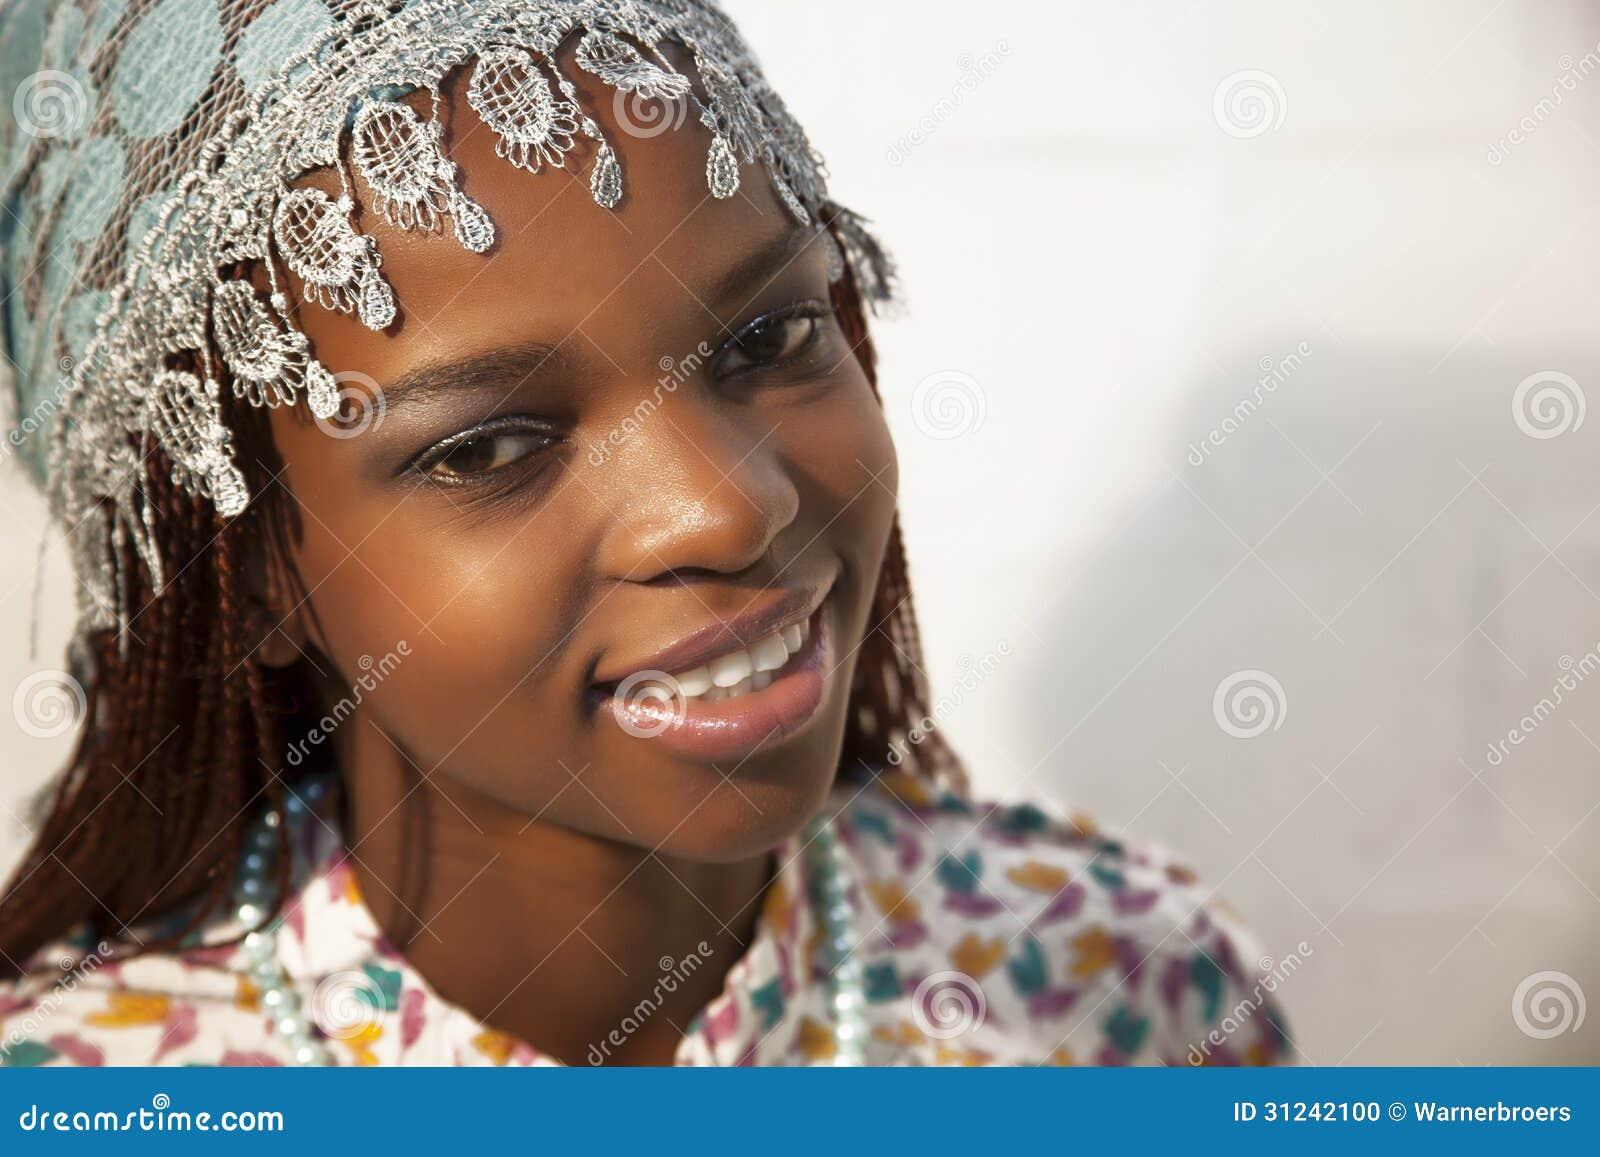 portrait de jeune belle femme africaine photo stock image 31242100. Black Bedroom Furniture Sets. Home Design Ideas